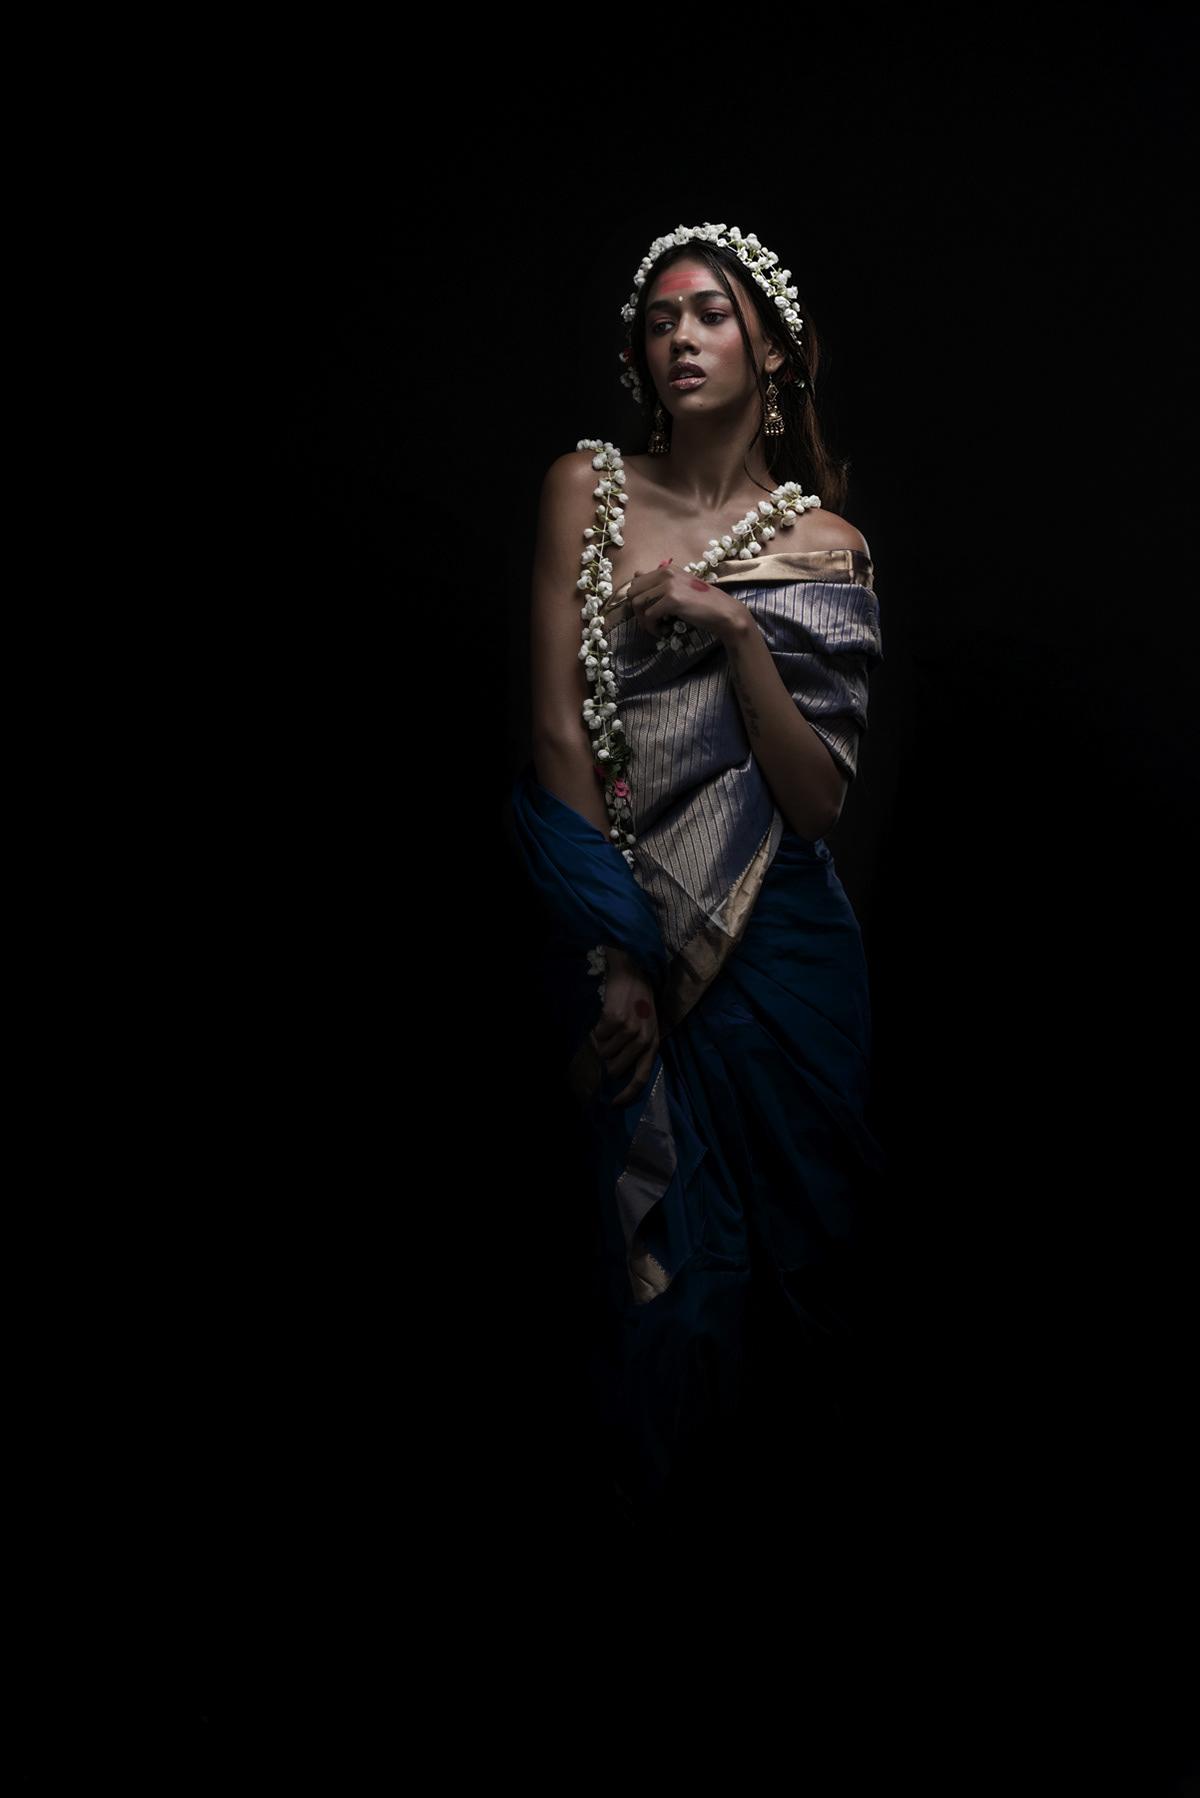 goddess God India Sari fashion shoot styling  Indian art artist MUMBAI